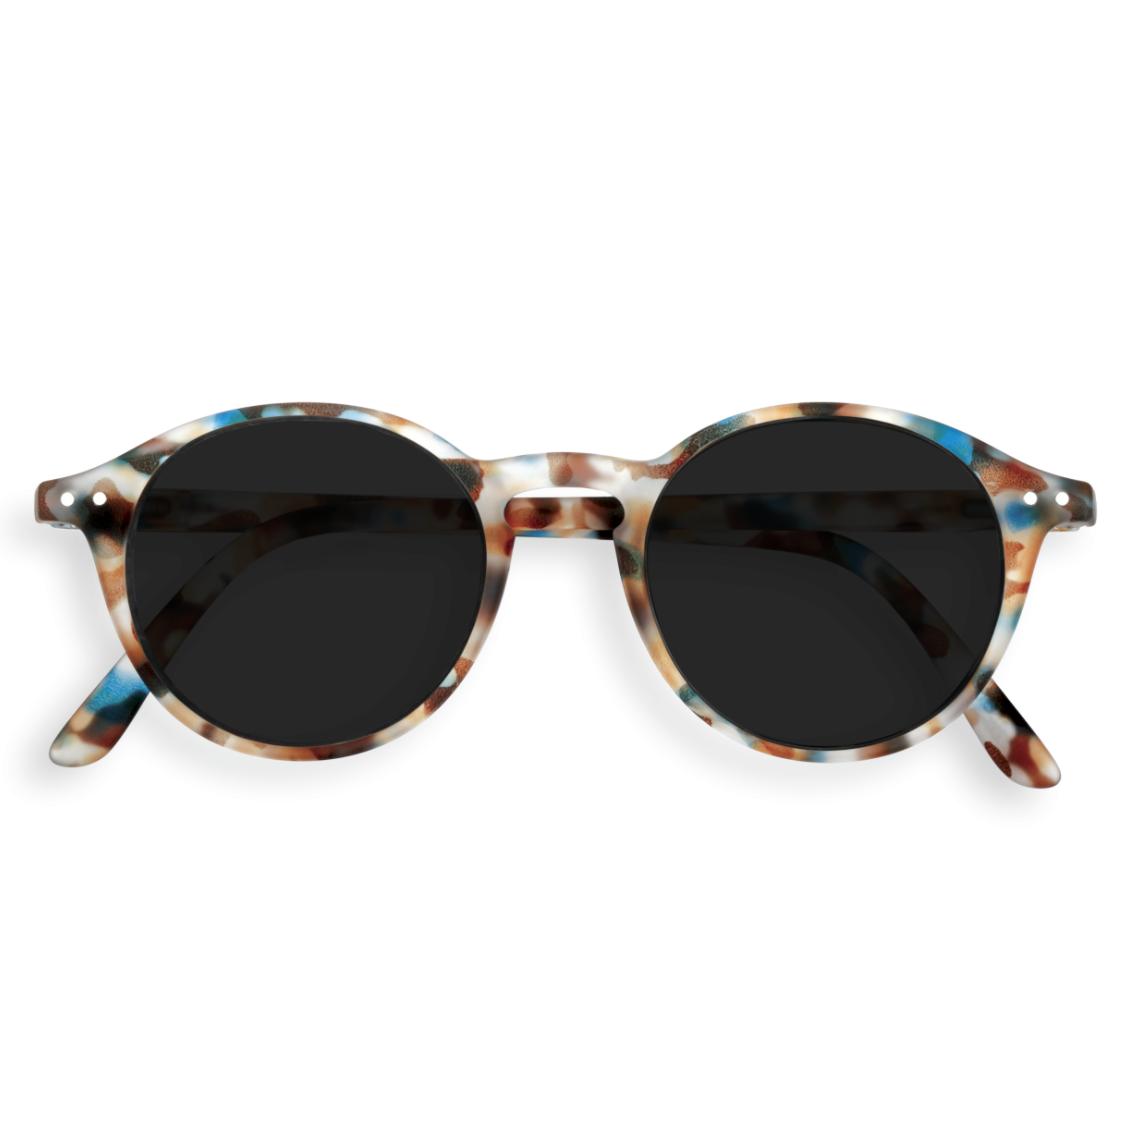 Sunglasses #D - Blue Tortoise